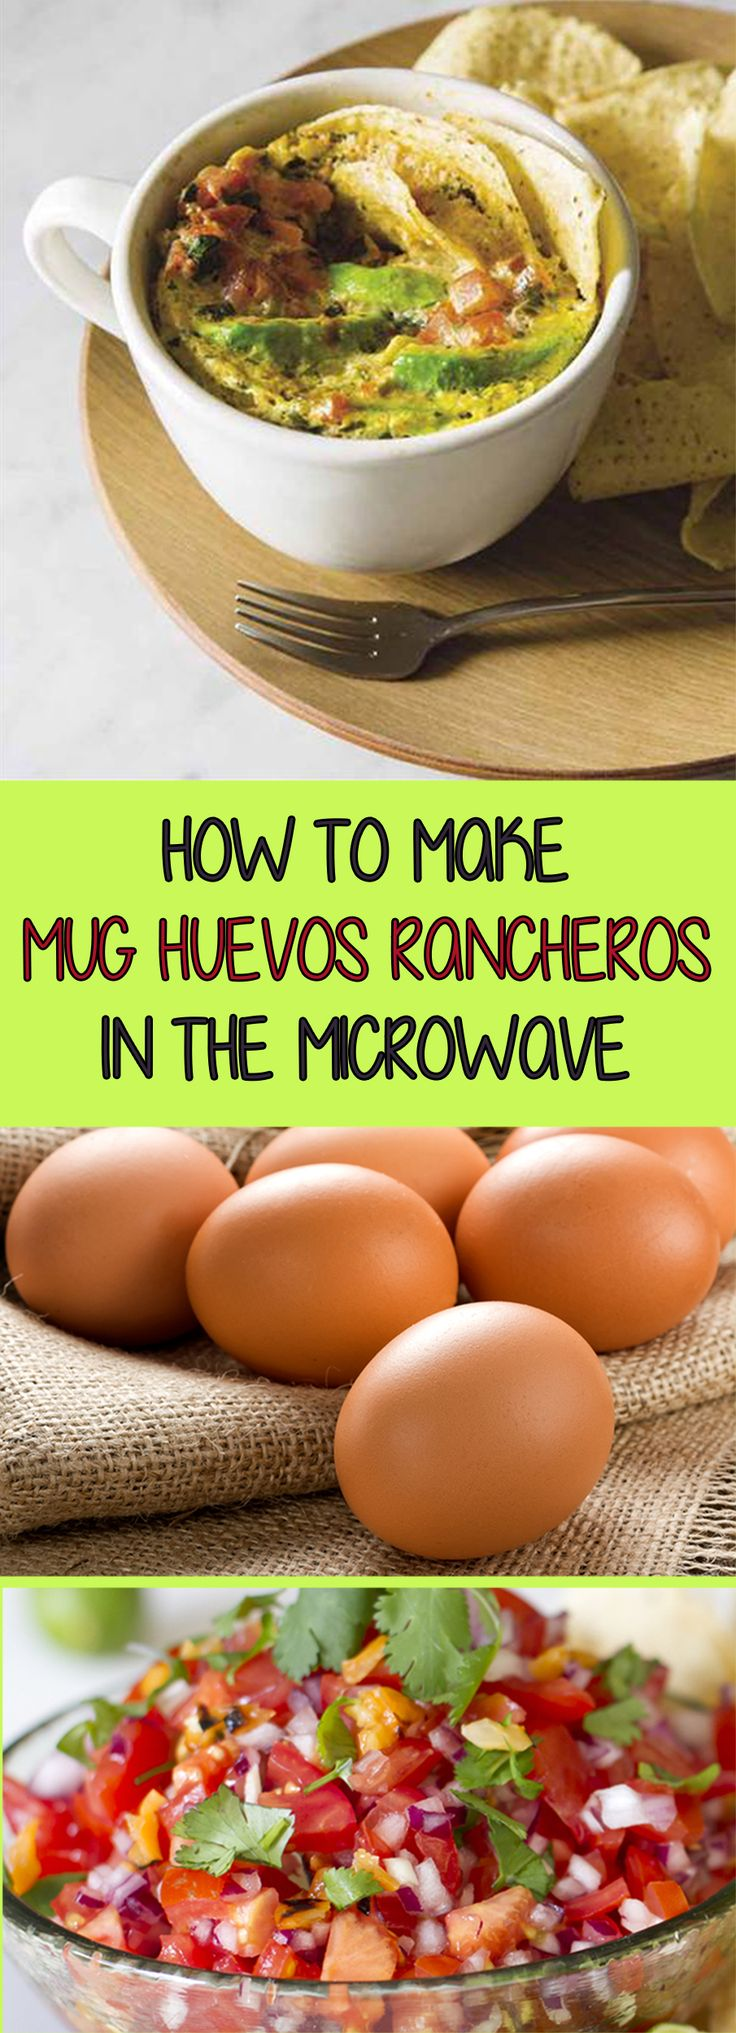 Make a 3-minute huevos rancheros recipe in a mug